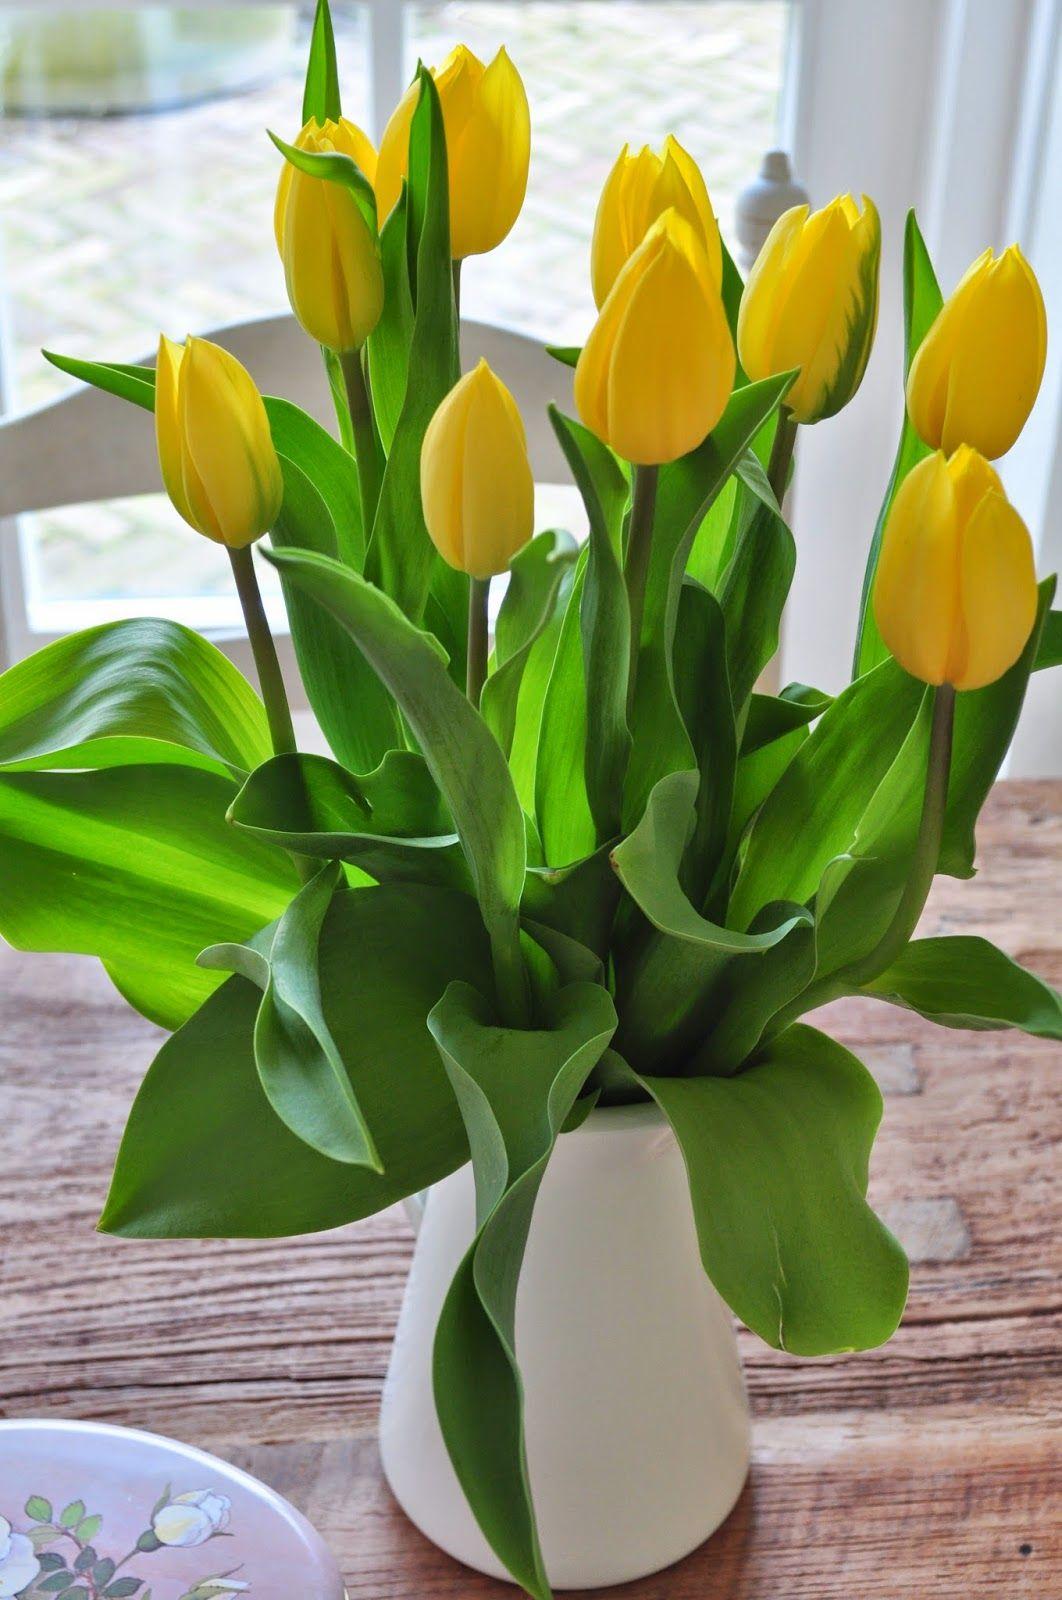 T bezige bijtje pretty flowers pinterest flowers yellow quenalbertini yellow tulips in a white vase floridaeventfo Gallery